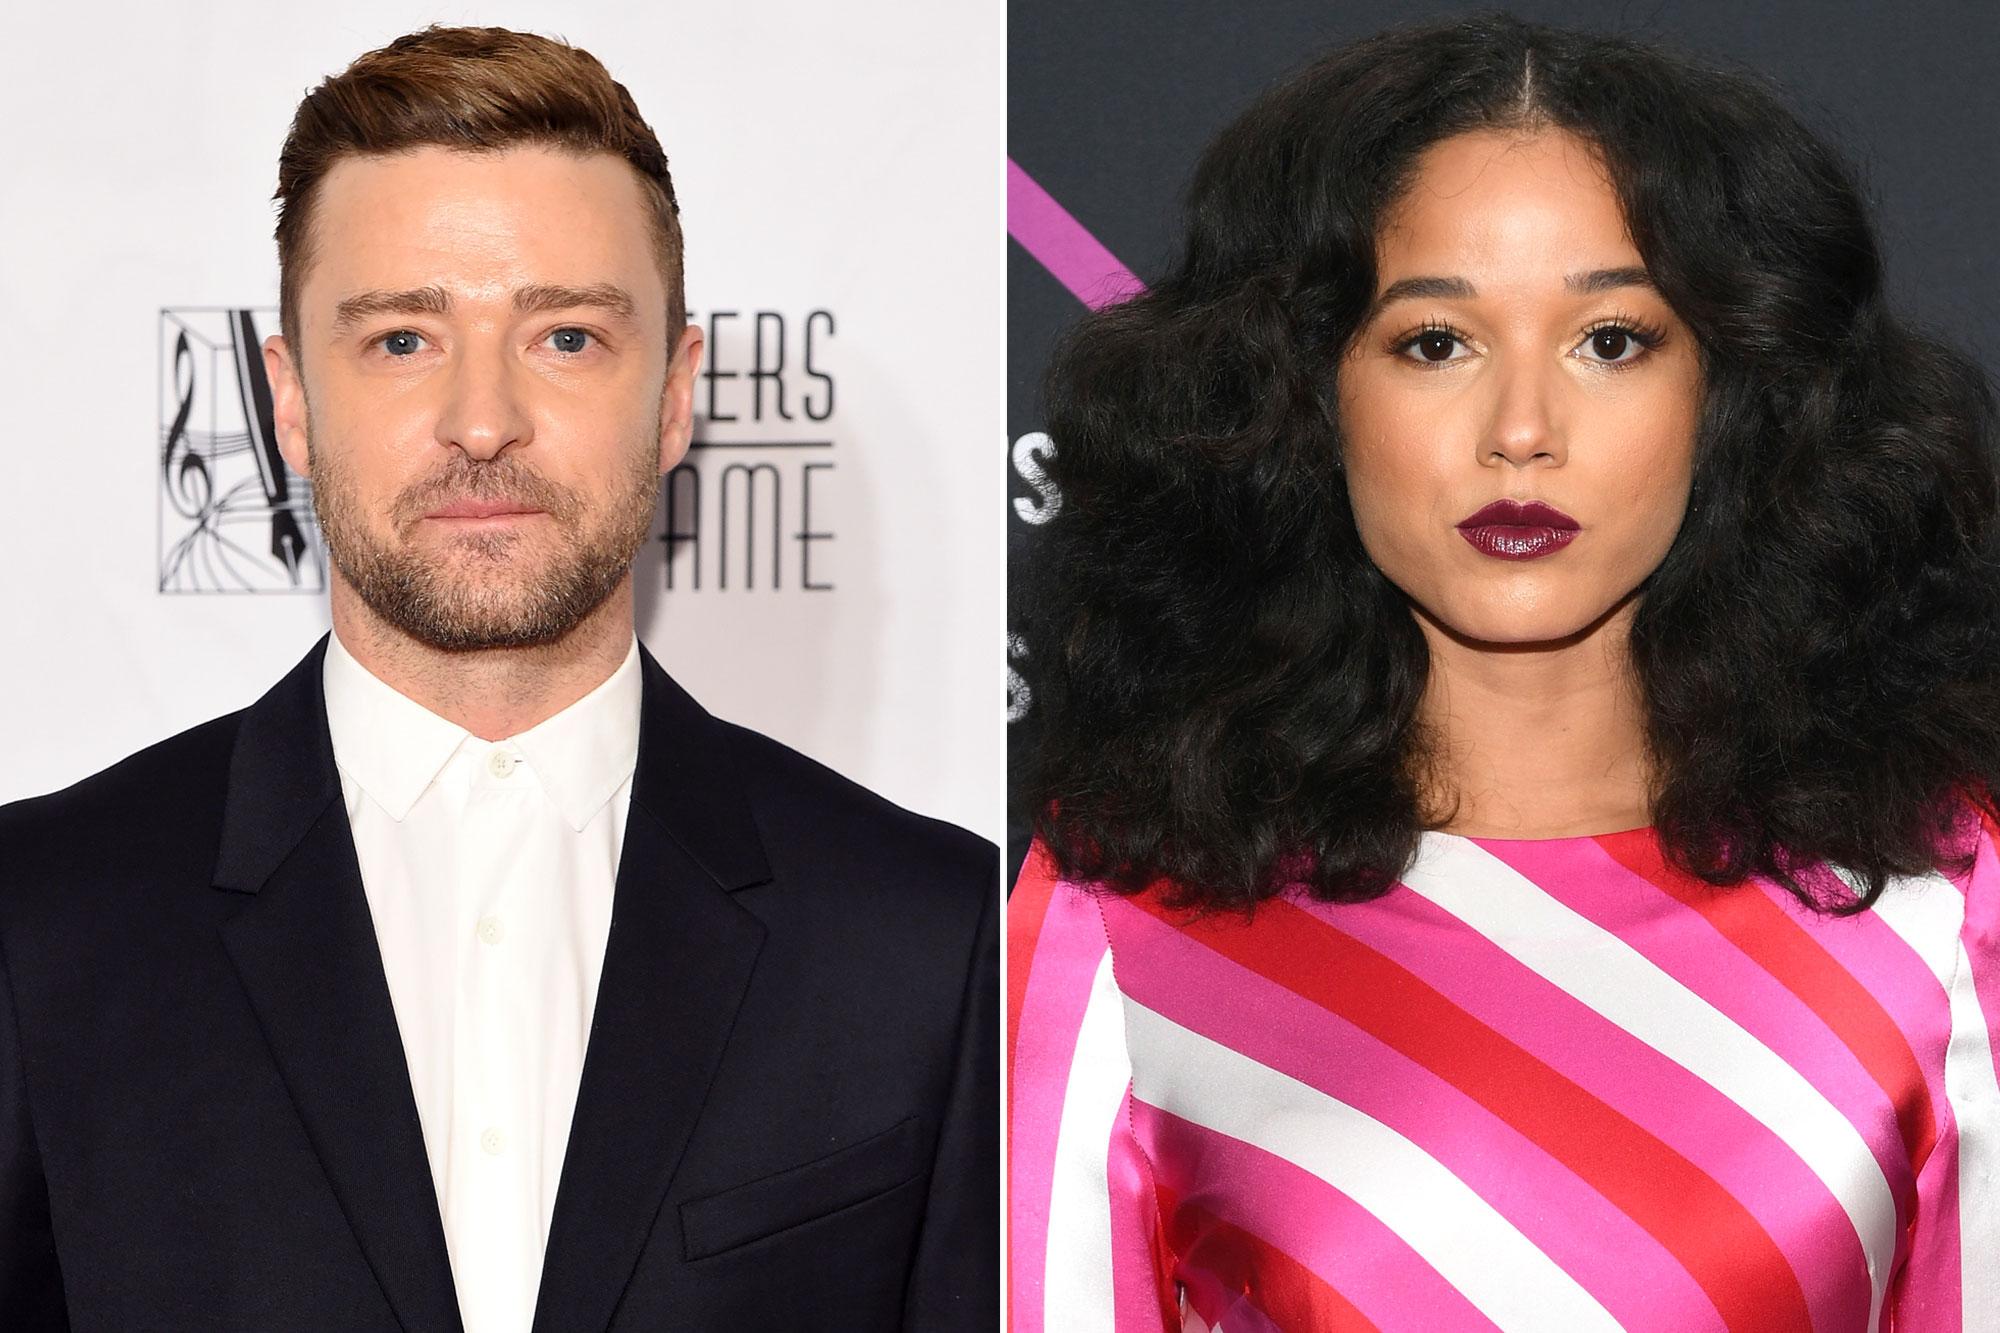 Justin Timberlake and Alisha Wainwright